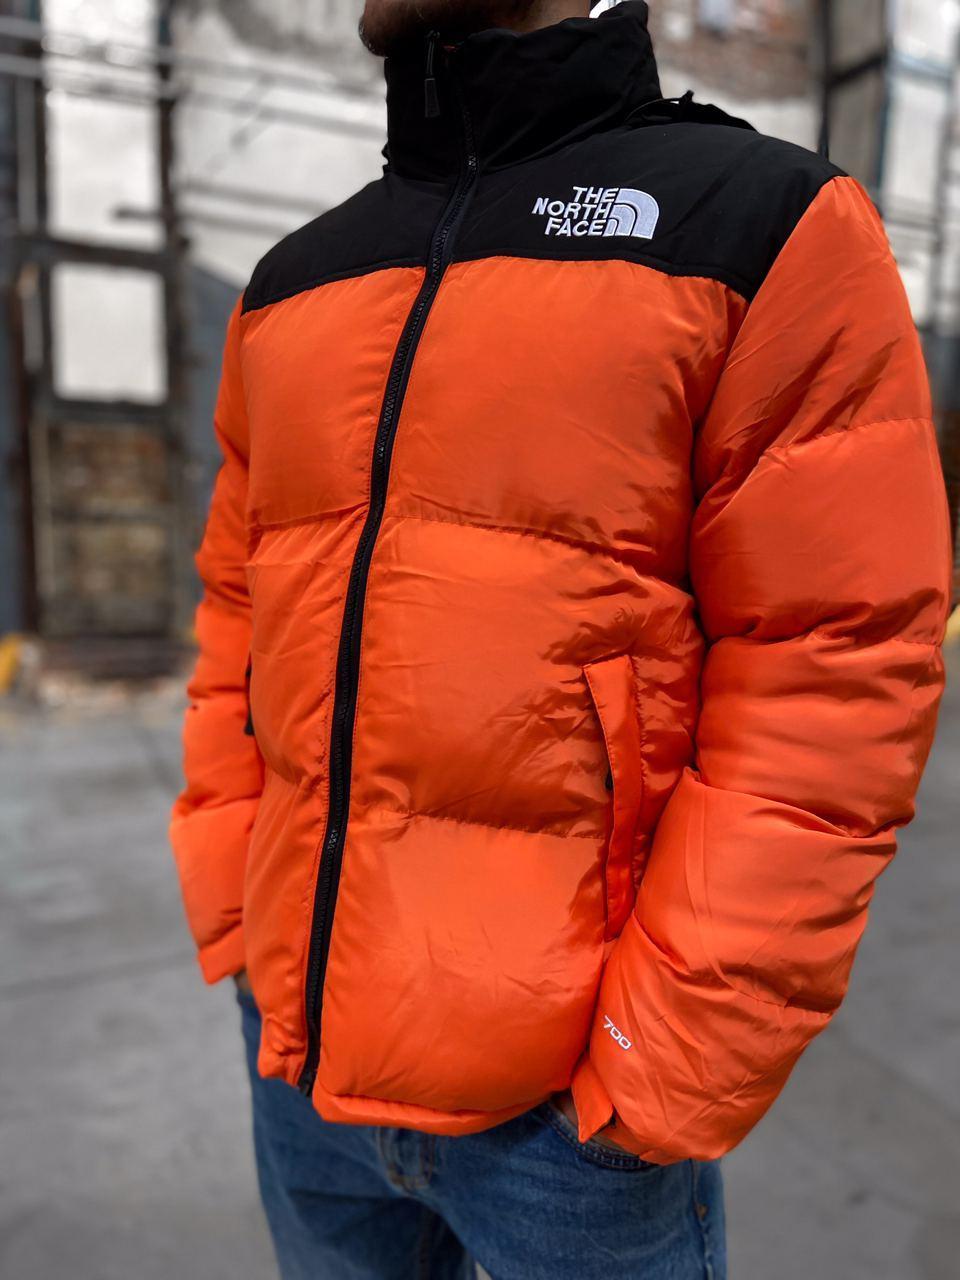 Пуховик - Чоловічий Пуховик The North Face x Supreme Nuptse 700 Orange